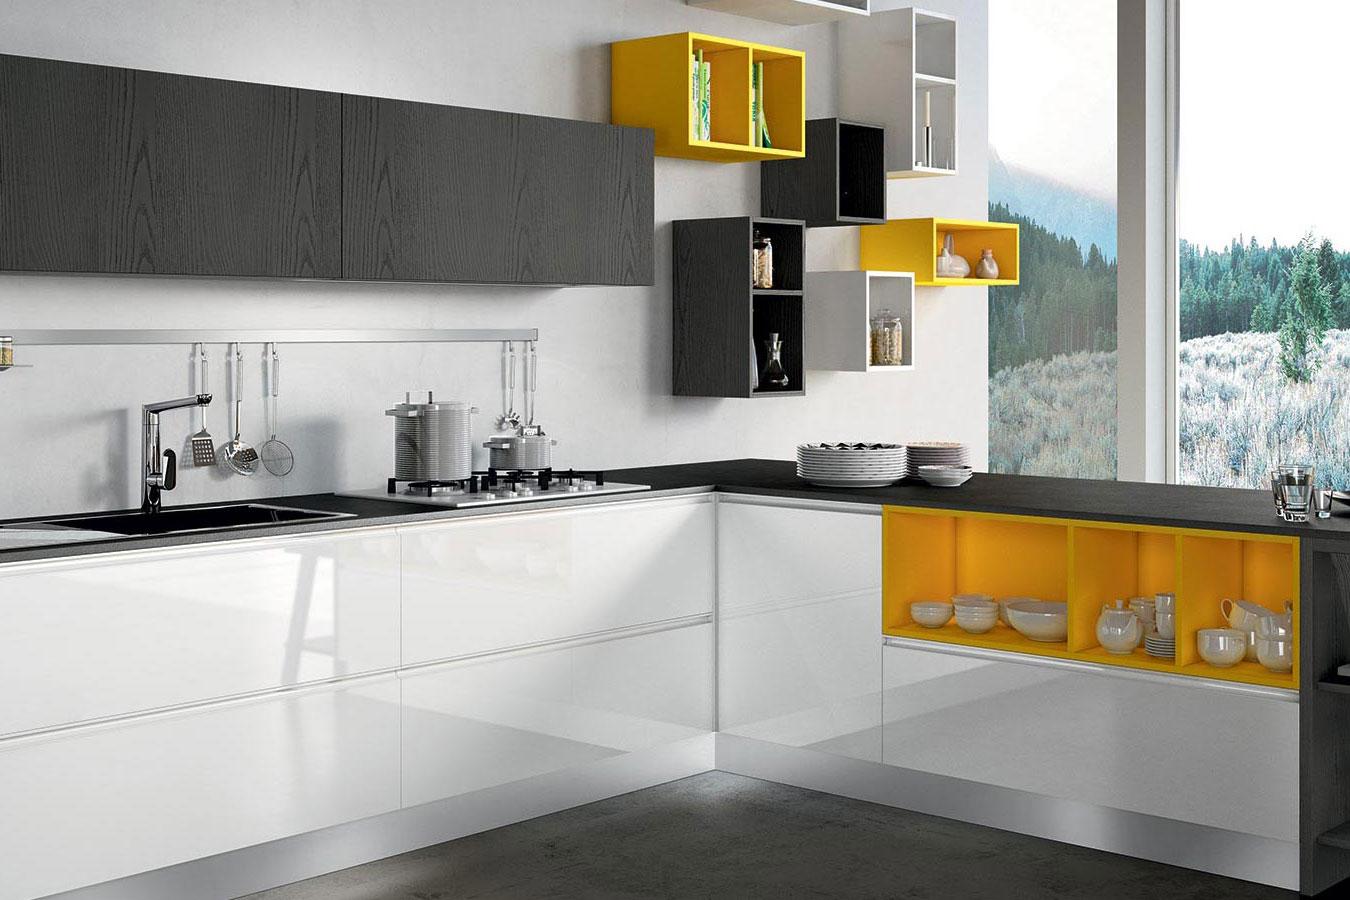 Beautiful cucina usata piemonte ideas for Cucina usata a milano